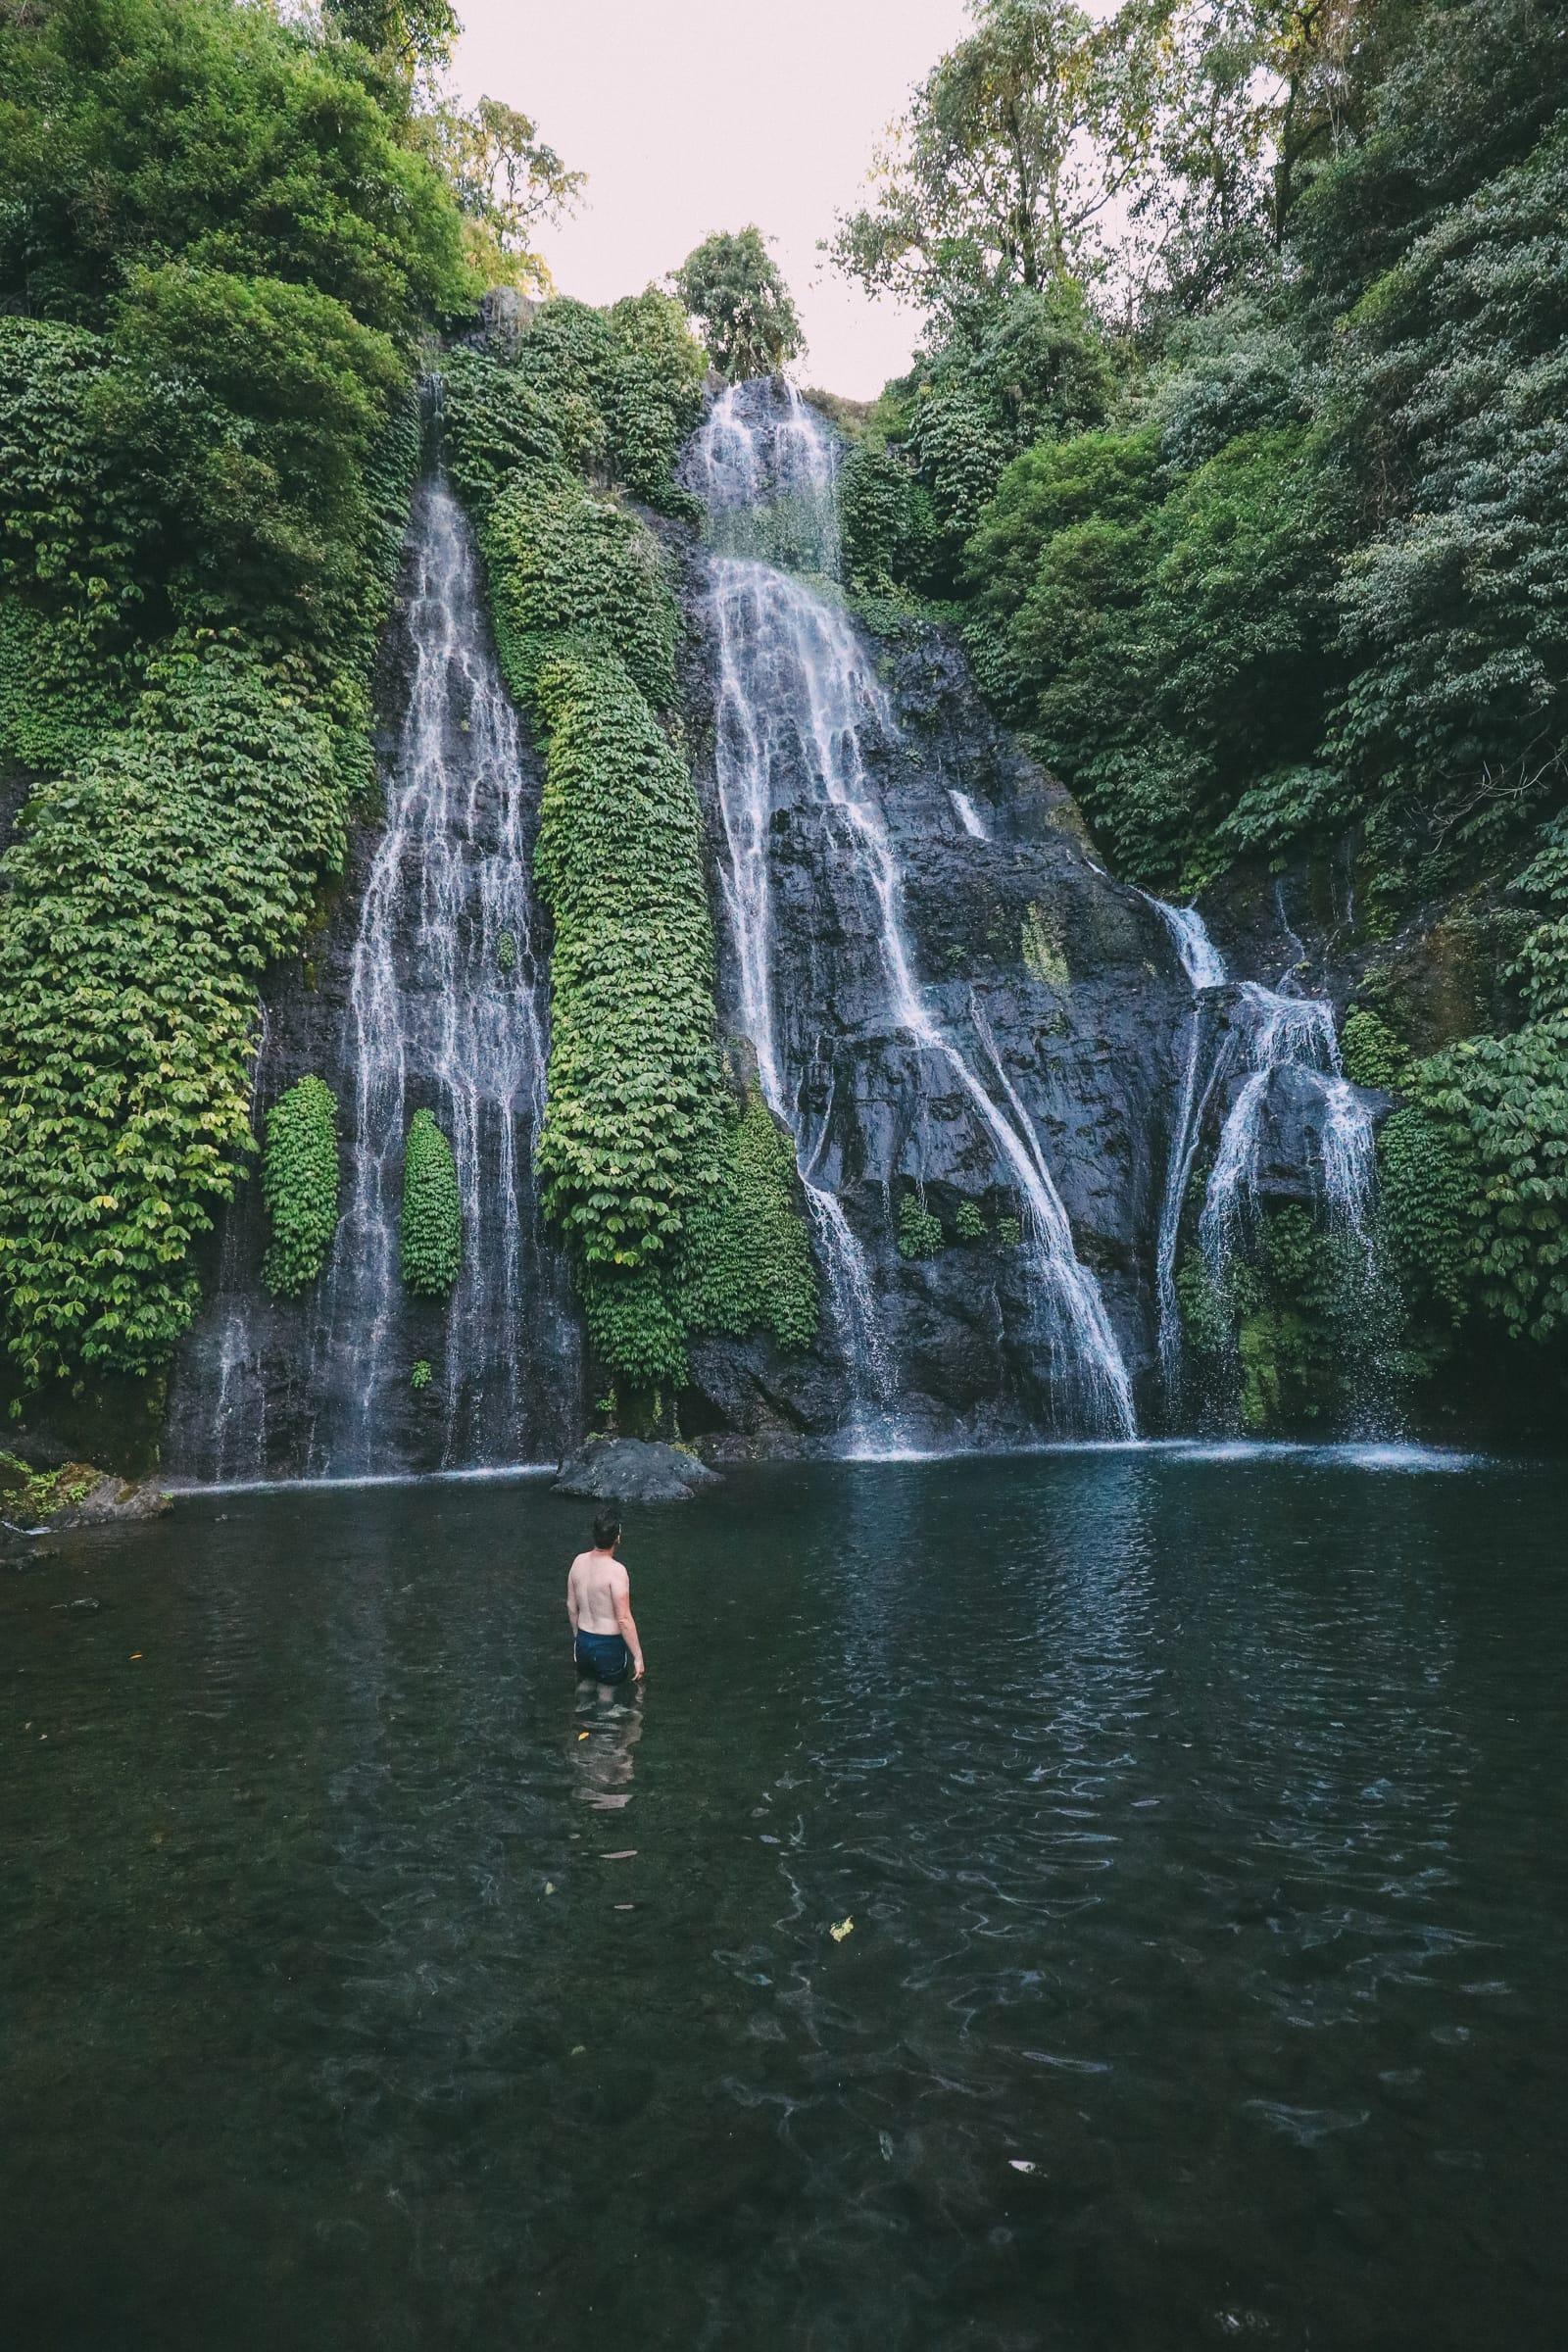 The Amazing Banyumala Twin Waterfalls In The Jungles Of Bali (12)